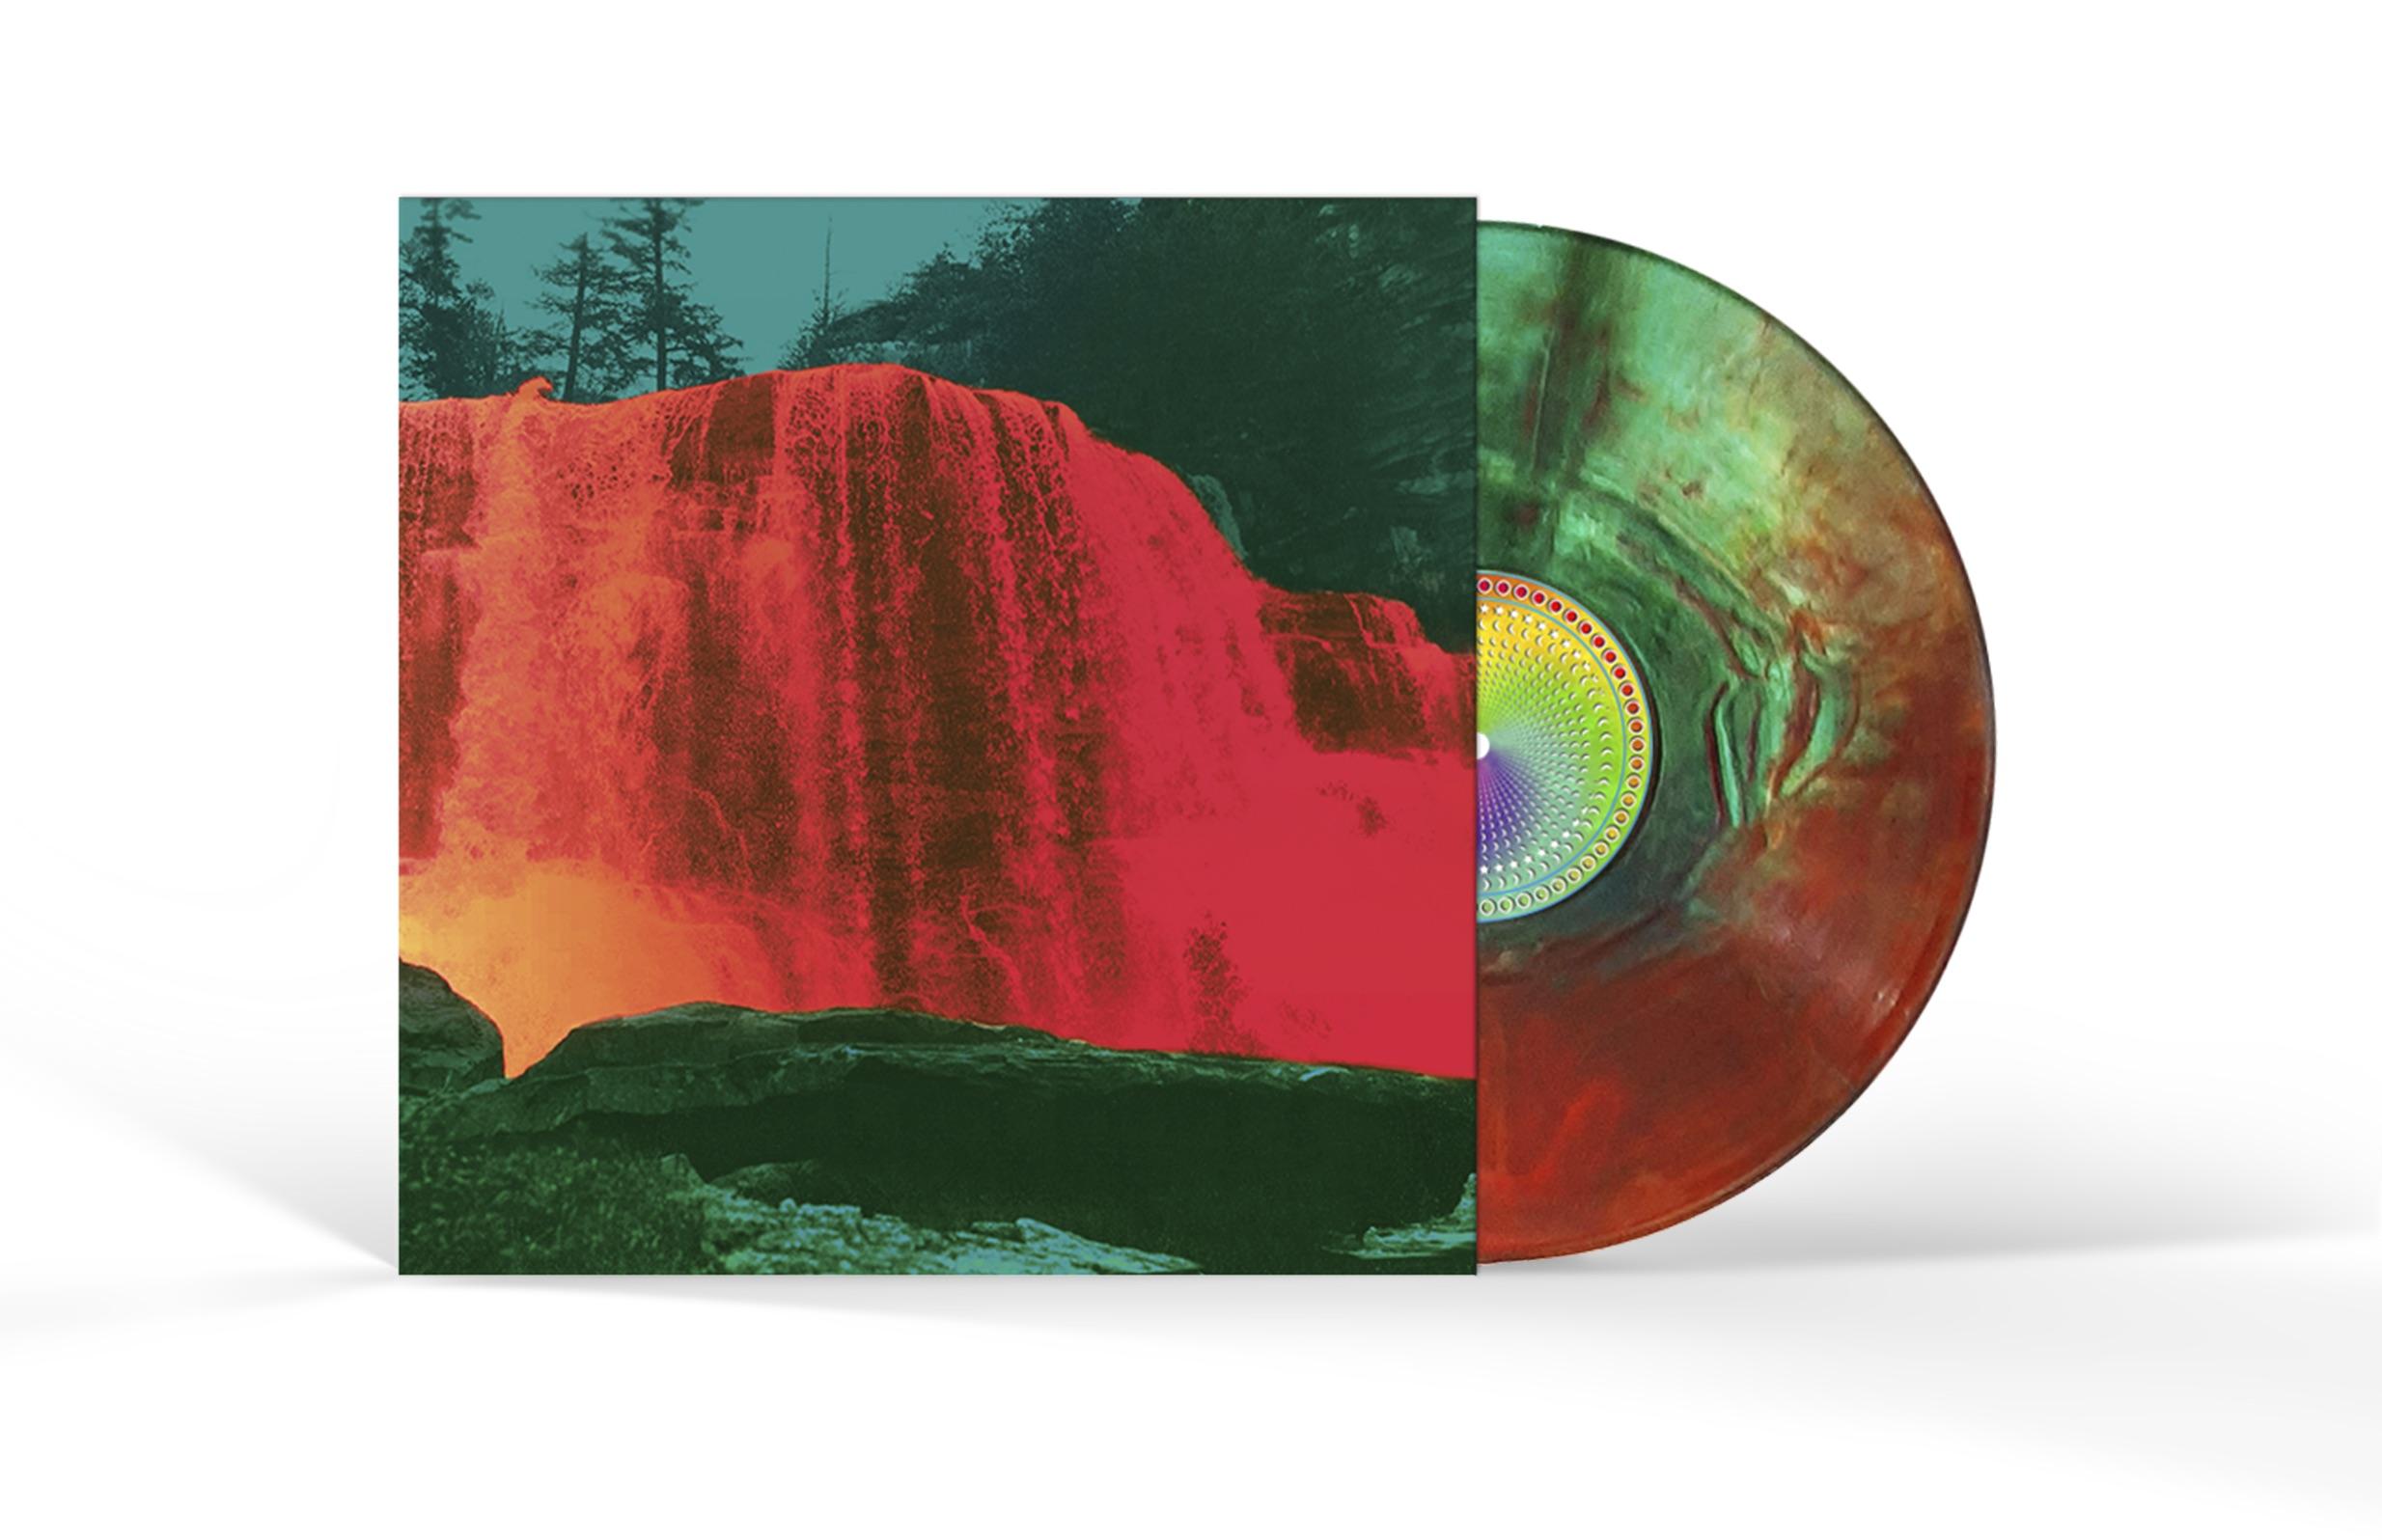 My Morning Jacket The Waterfall Ii Limited Edition Deluxe Orange Green Splash Lp Craft Vinyl Youbelonghere